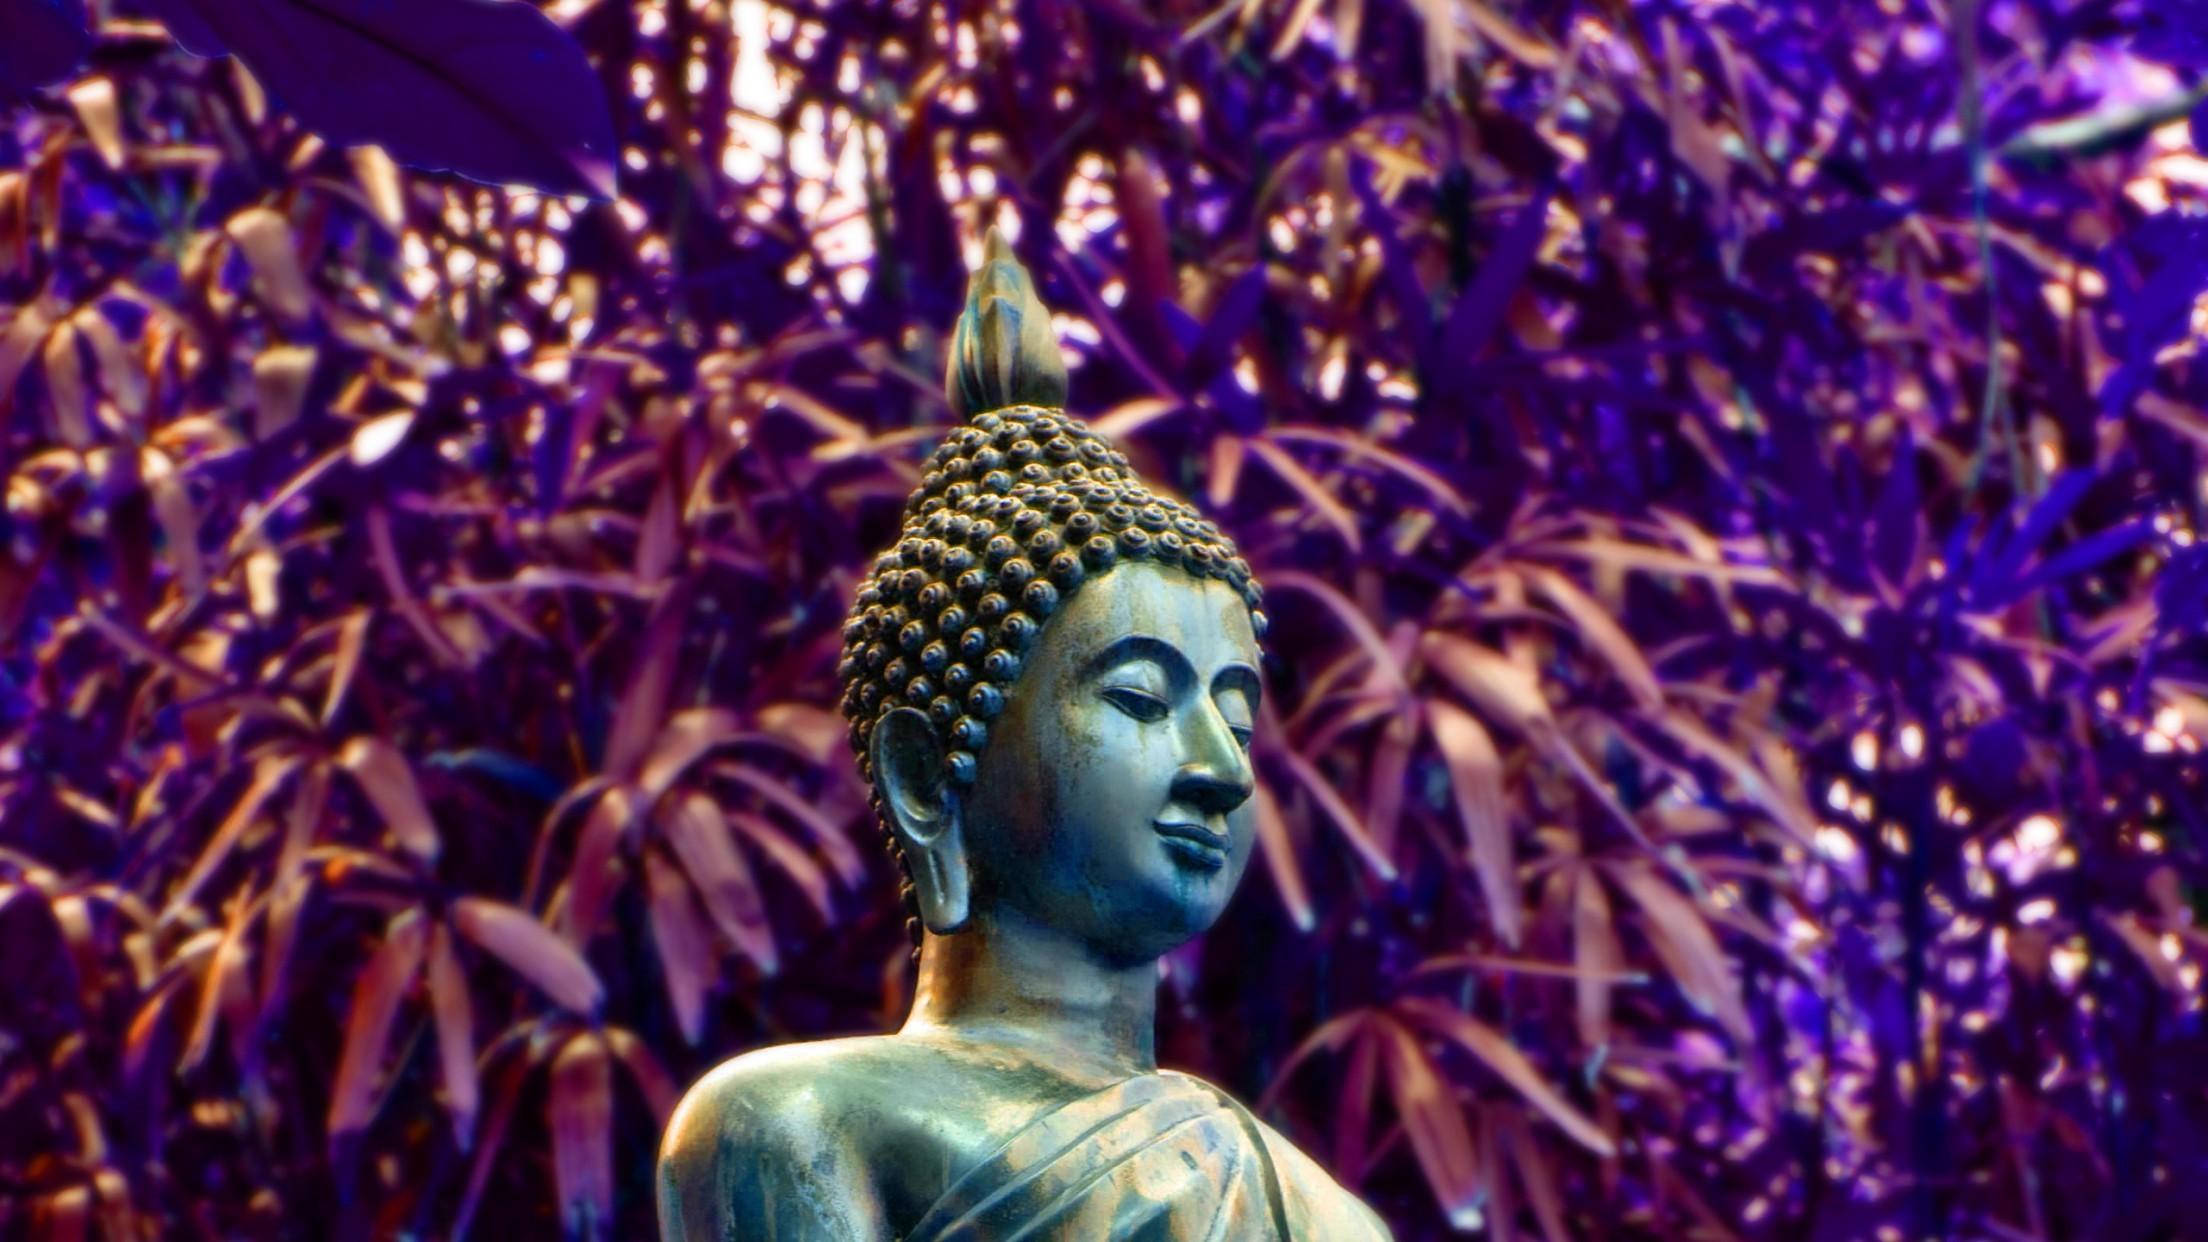 Buddha Statue Lyon Arboretum Hawai Hd Wallpapres